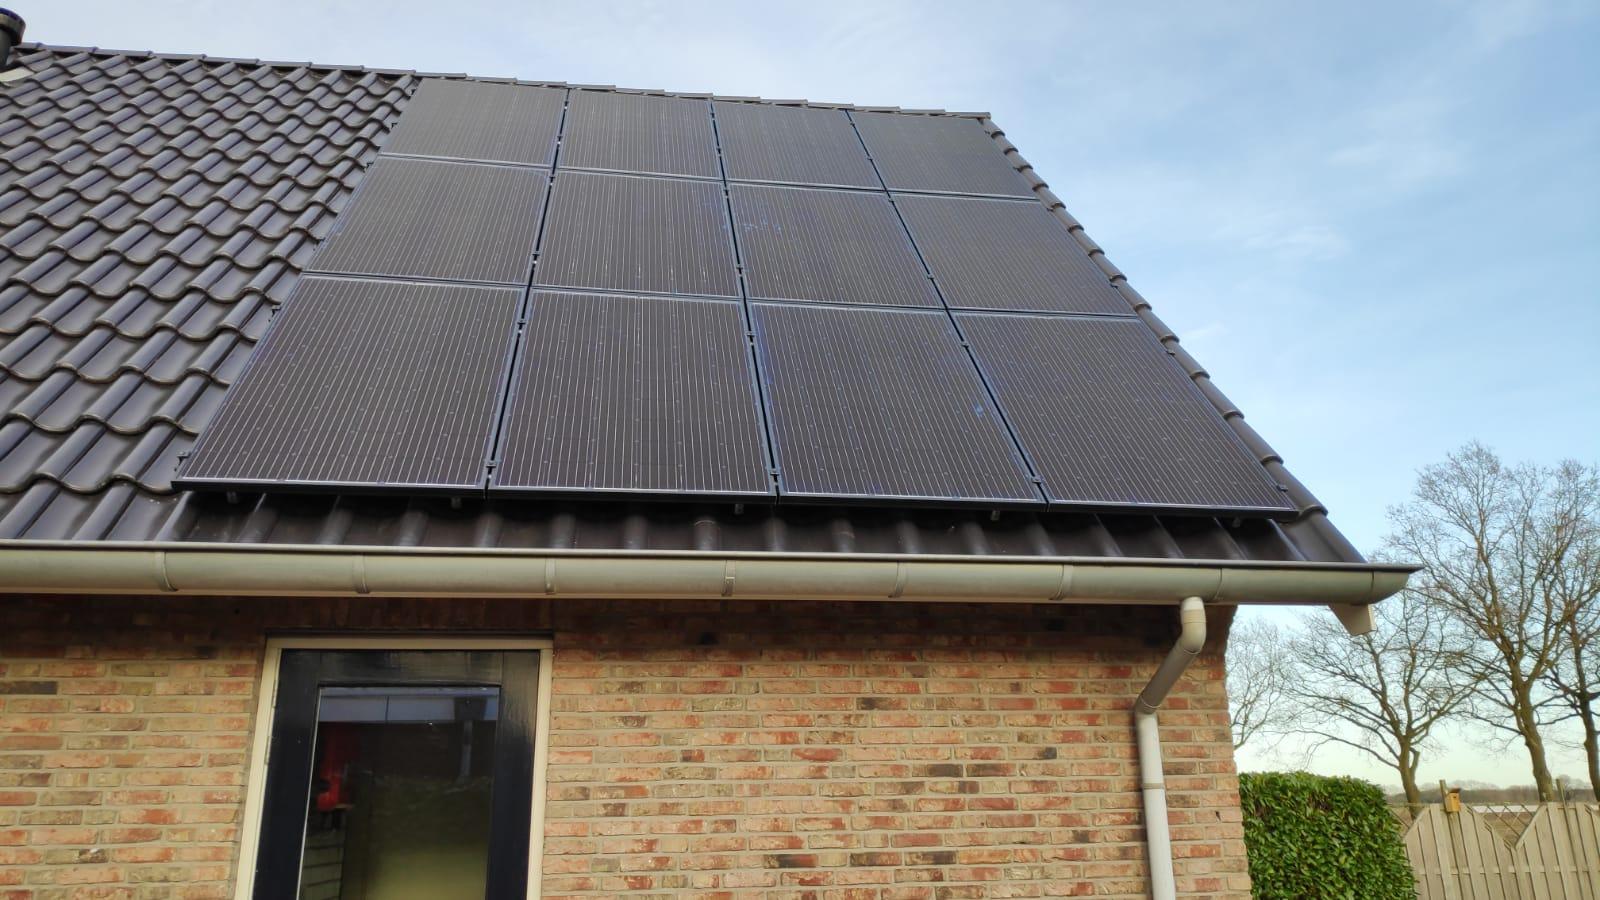 Solarwatt glas glas zonnepanelen Odoorn